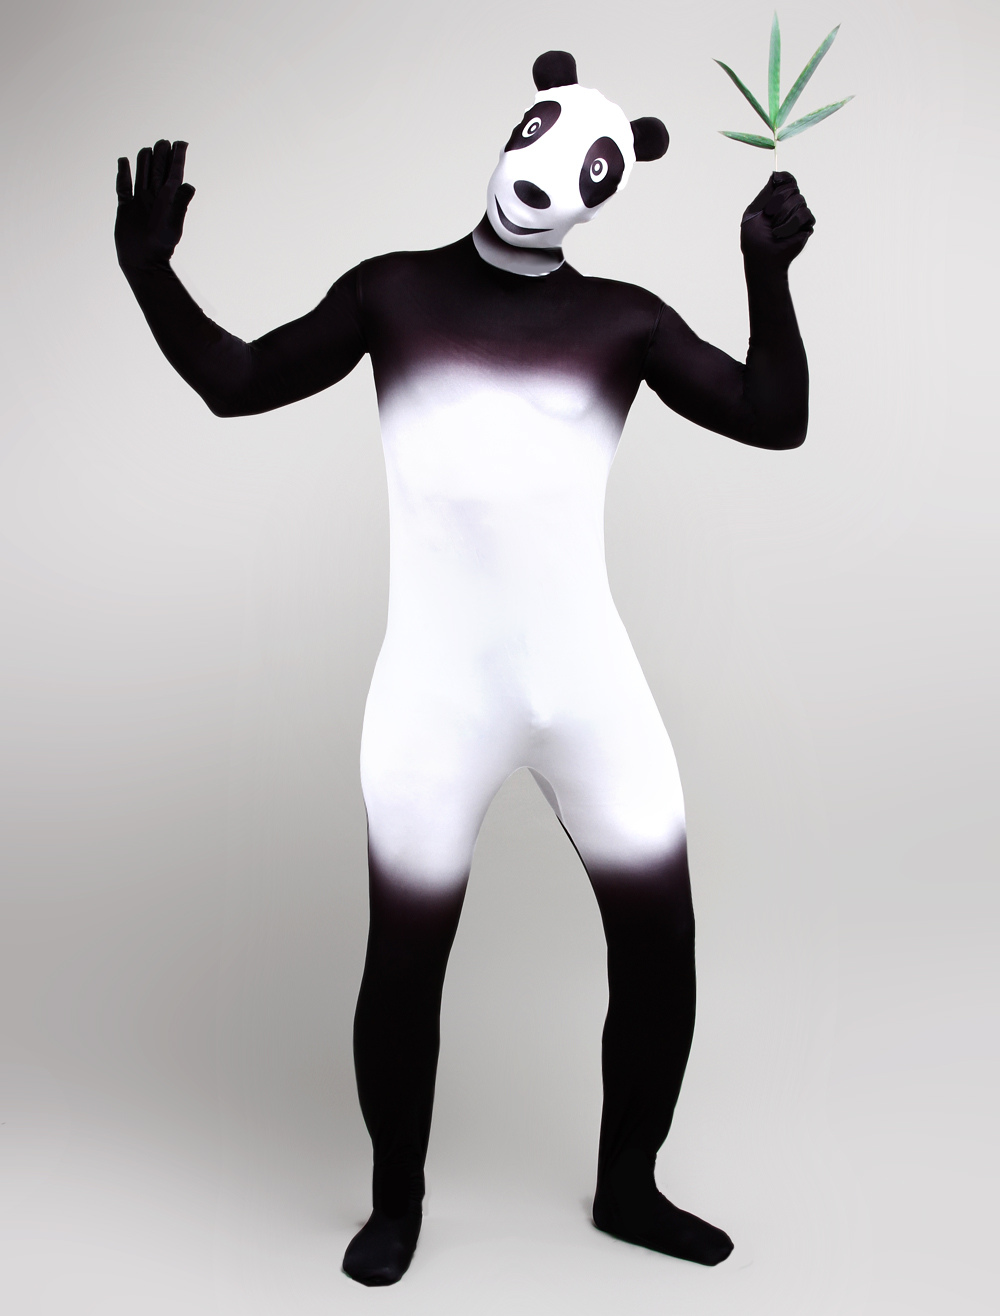 Halloween Black Panda Printed Zentai Suits Halloween